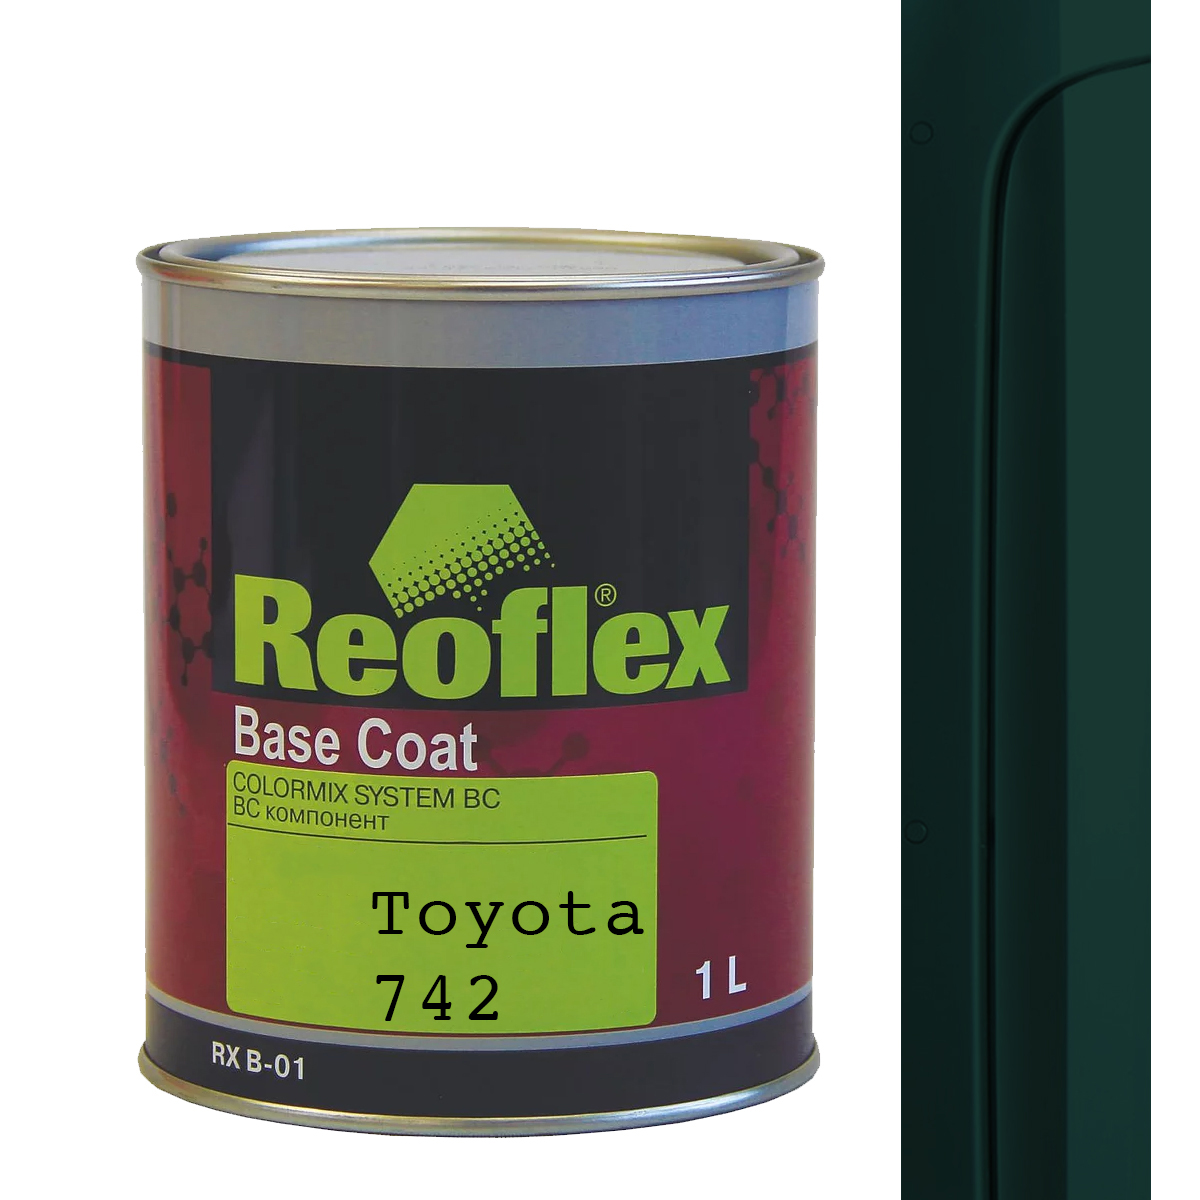 Reoflex Toyota 742